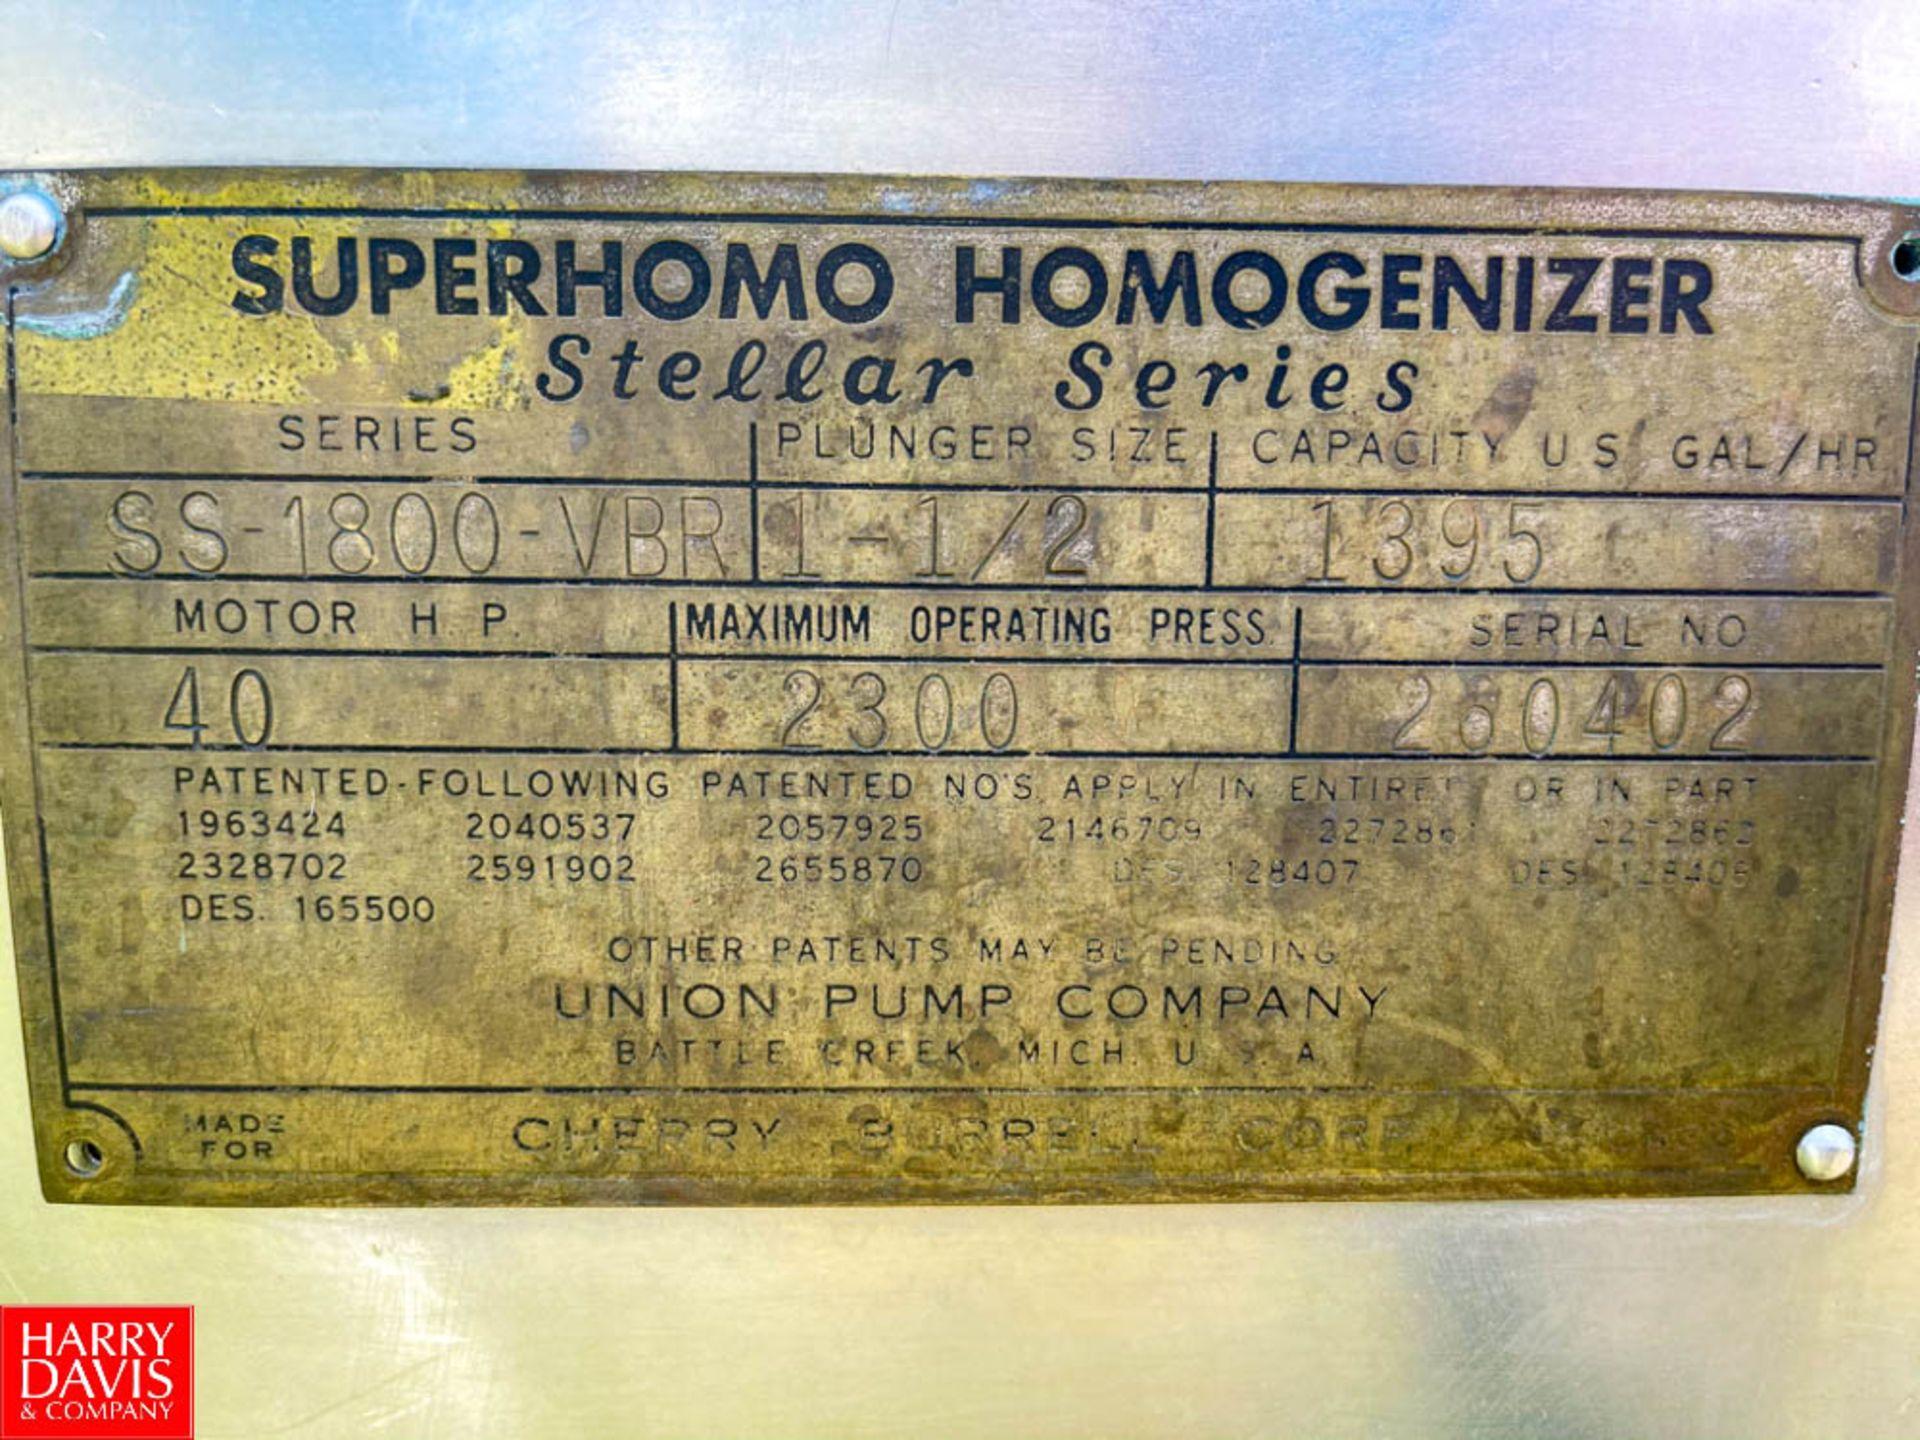 Cherry Burrell S/S Homogenizer Model: SS-1800-VBR : SN 280402, 2,300 PSI, with 40 HP Motor, - Image 3 of 3